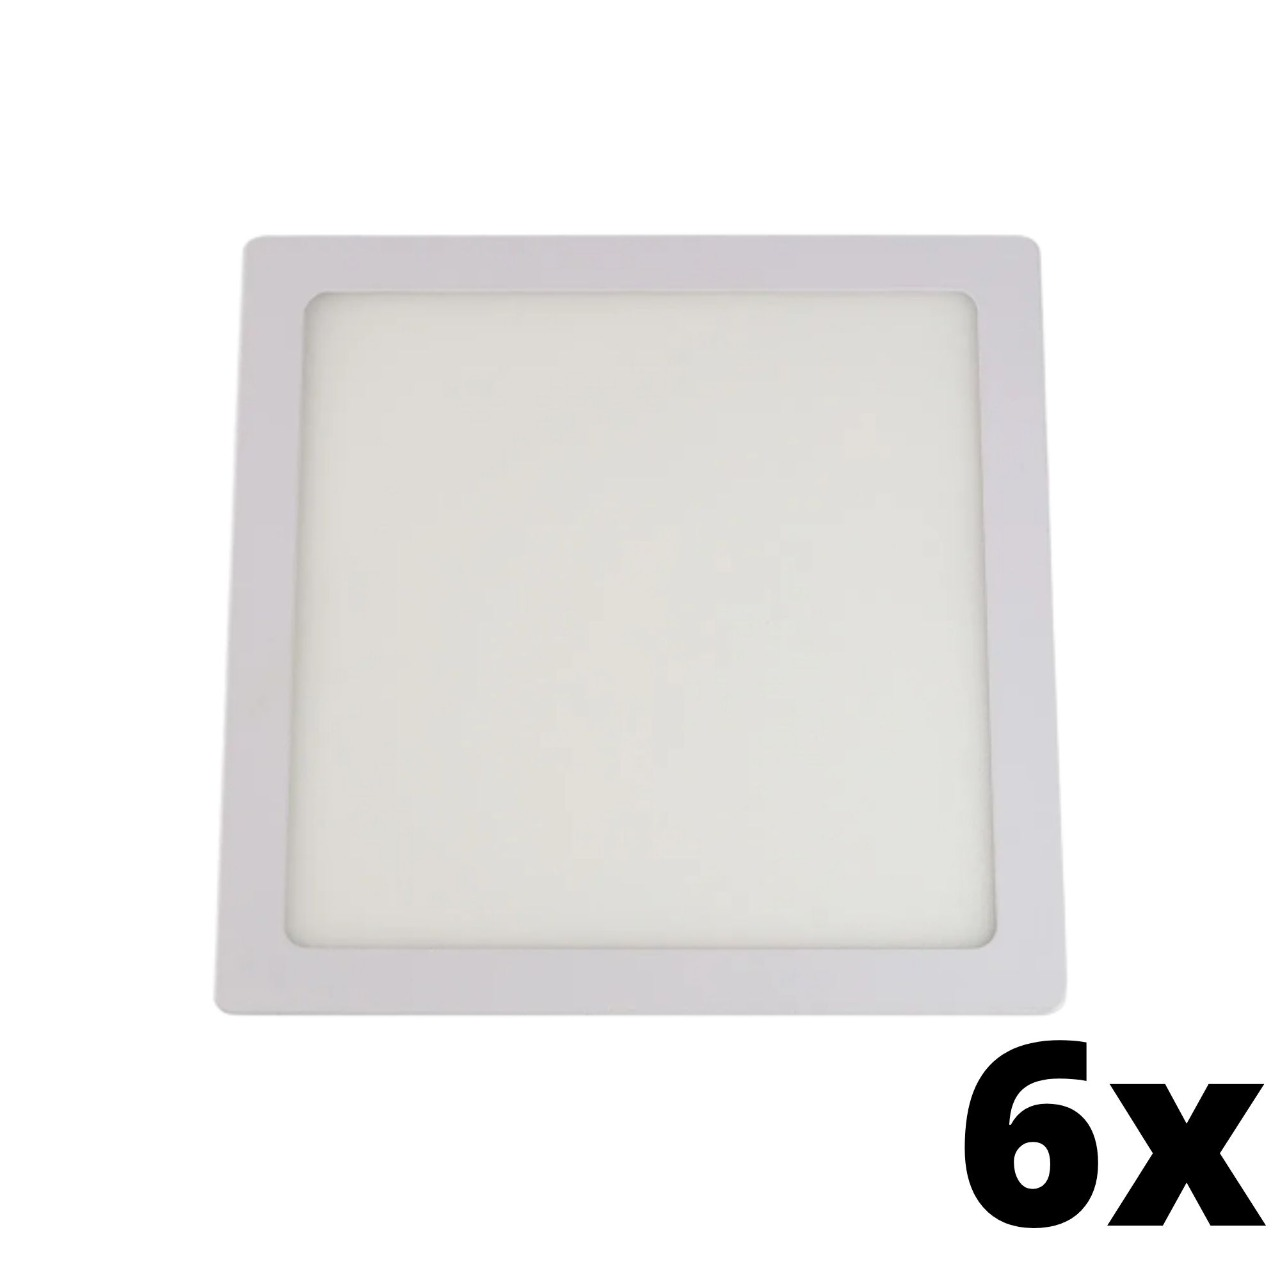 Kit 6 und Painel de Led Embutir 24w Quadrado 3000k